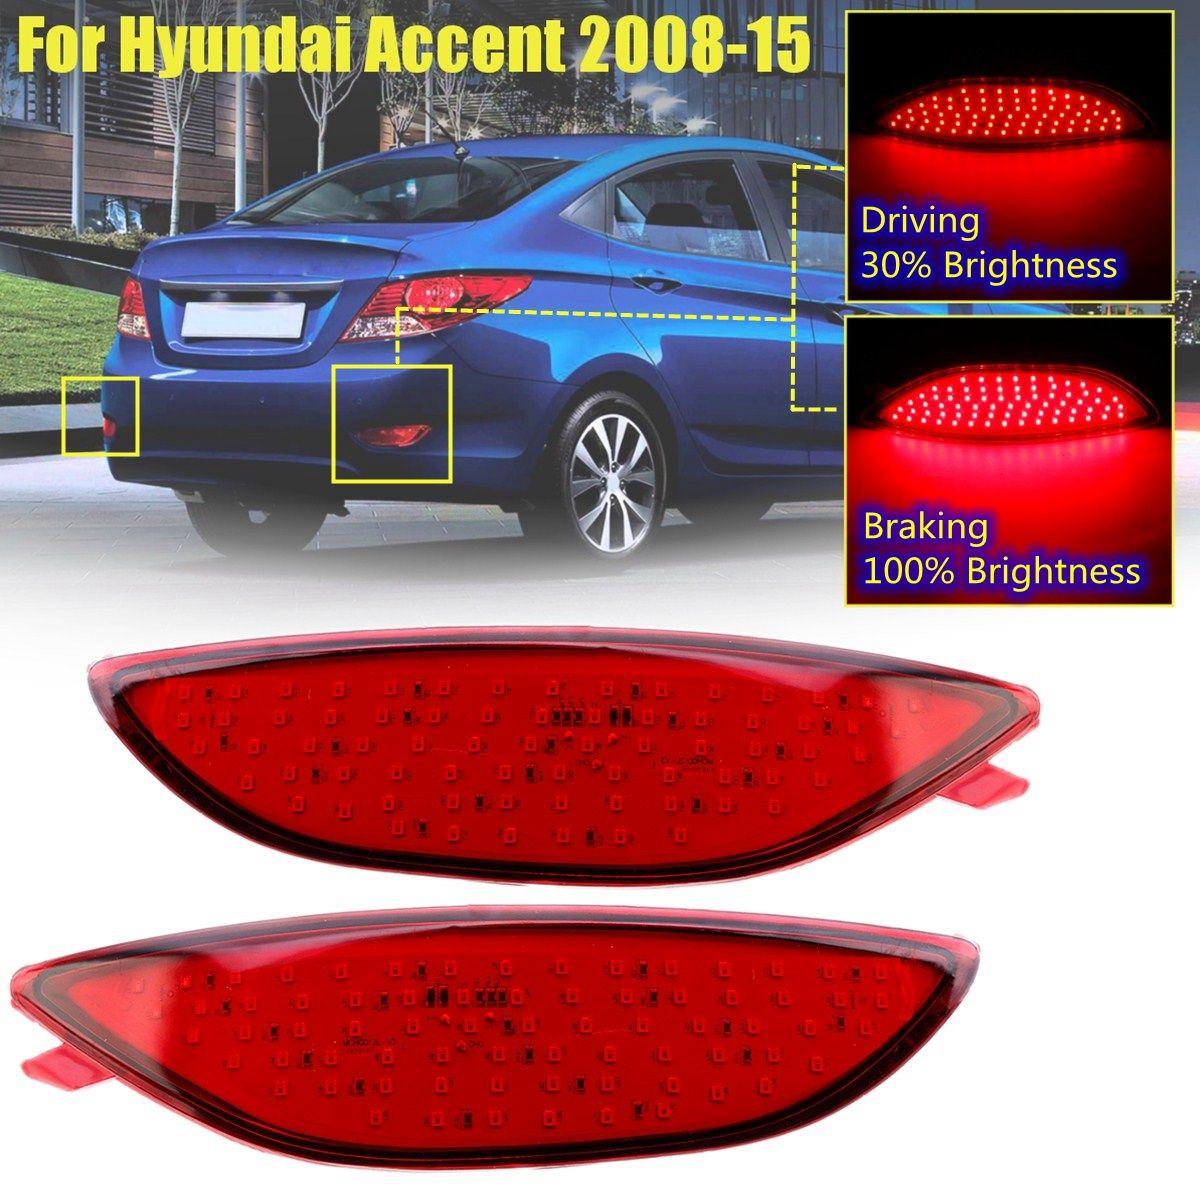 Rear Bumper Tail Reflector Stop Fog Brake Light Red Lens LED Bulb Car Warning Lamp for Hyundai Accent 2008 2009 2010 2011-2015